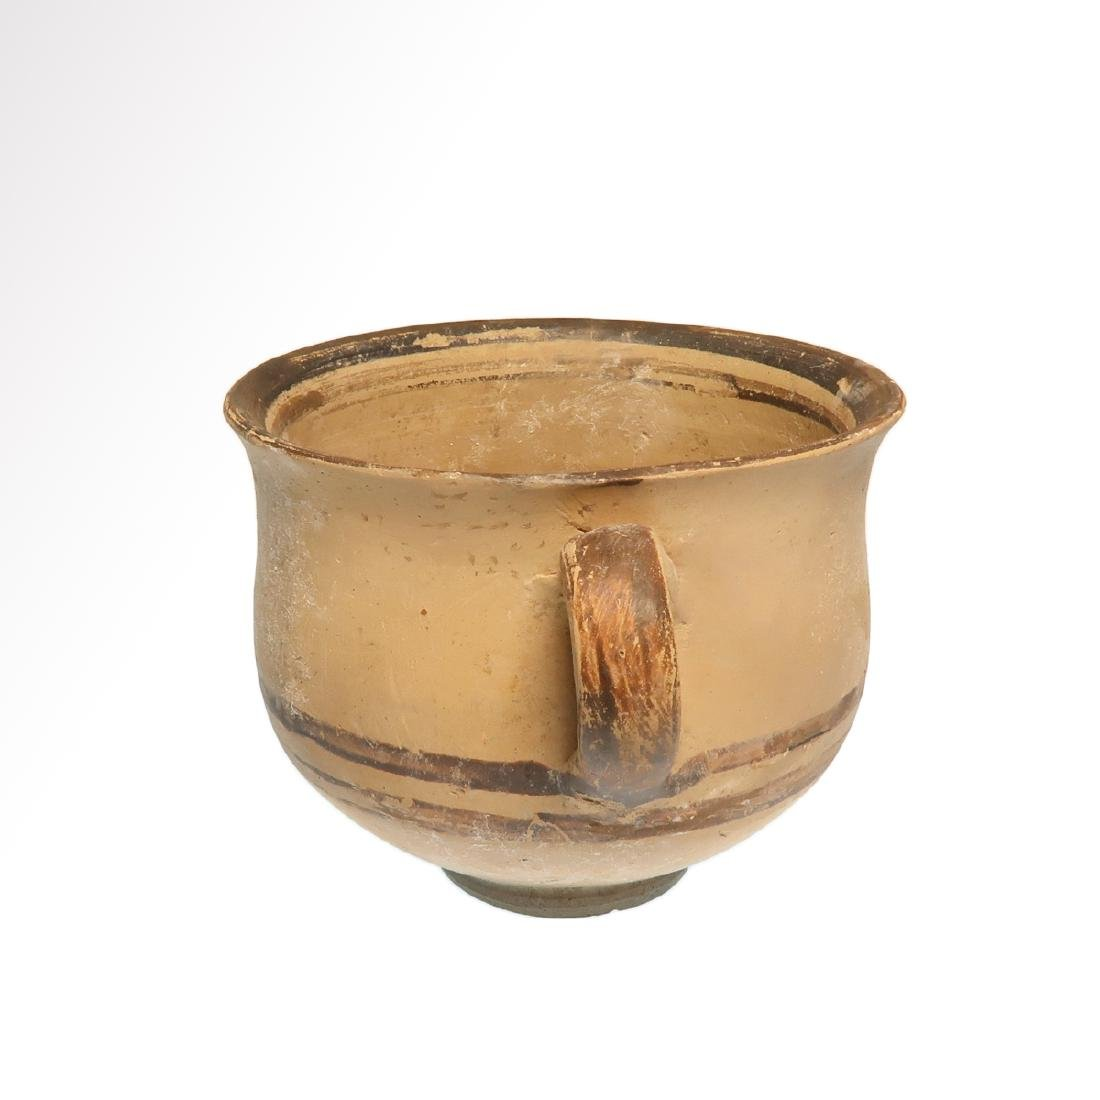 Greek Daunian Cup, c. 4th century B.C. - 4